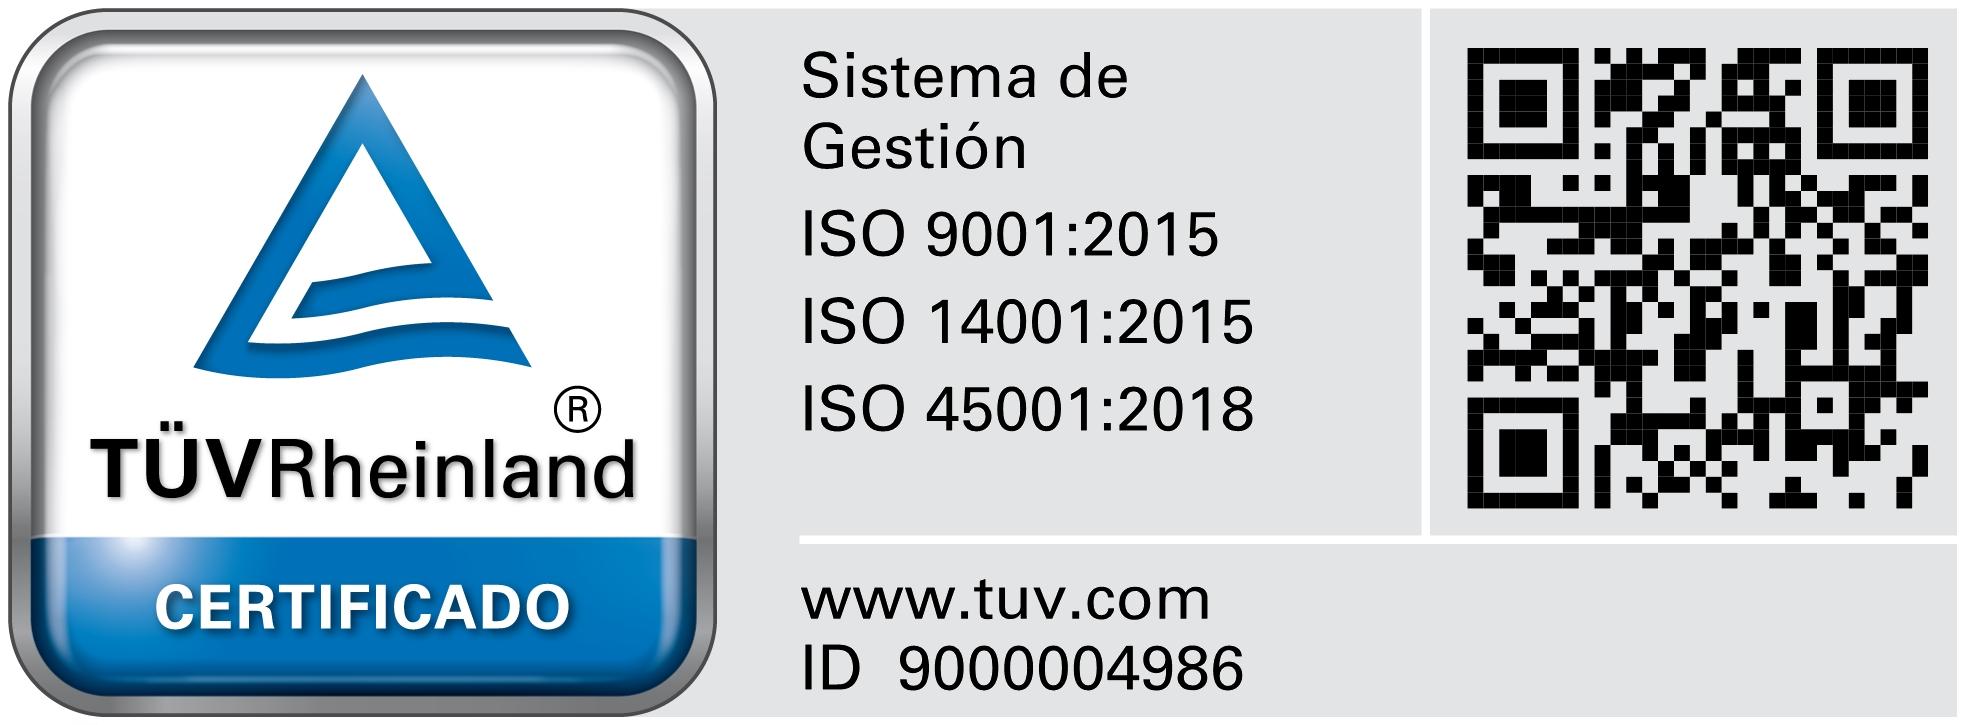 TR-Testmark_9000004986_ES_CMYK_with-QR-Code